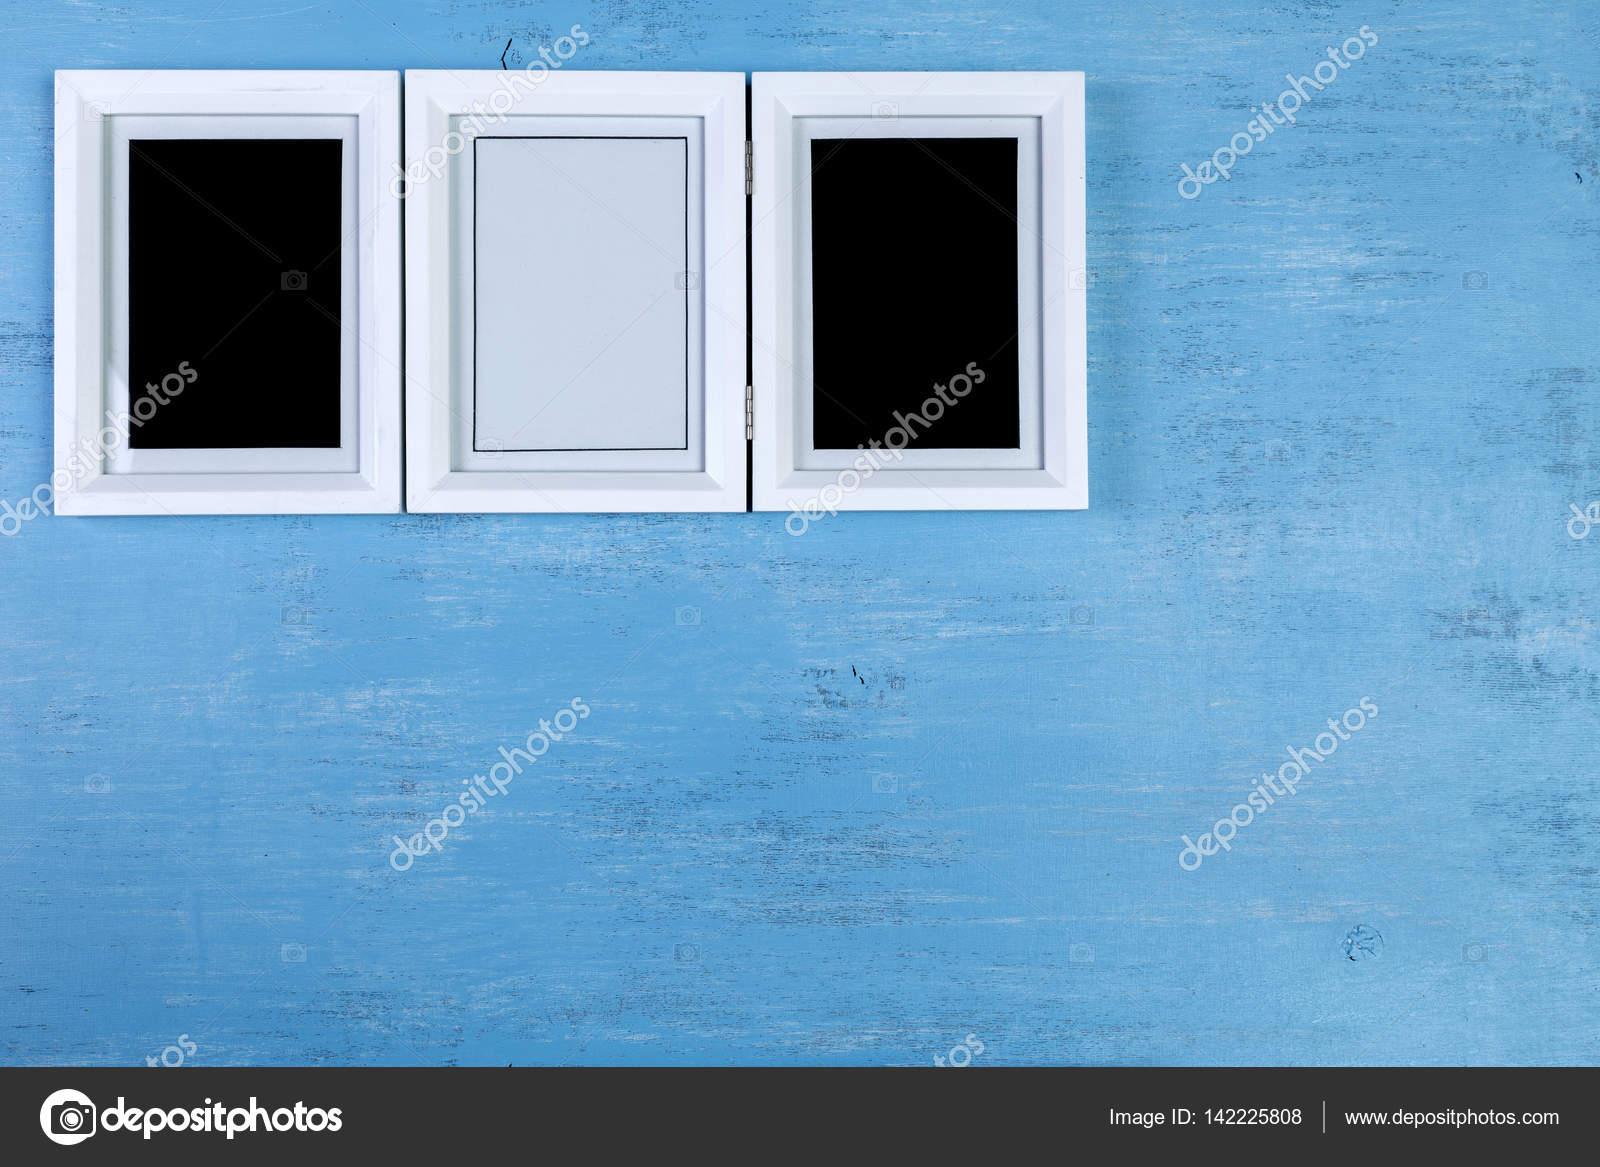 Marcos en blanco sobre fondo azul de madera — Fotos de Stock ...